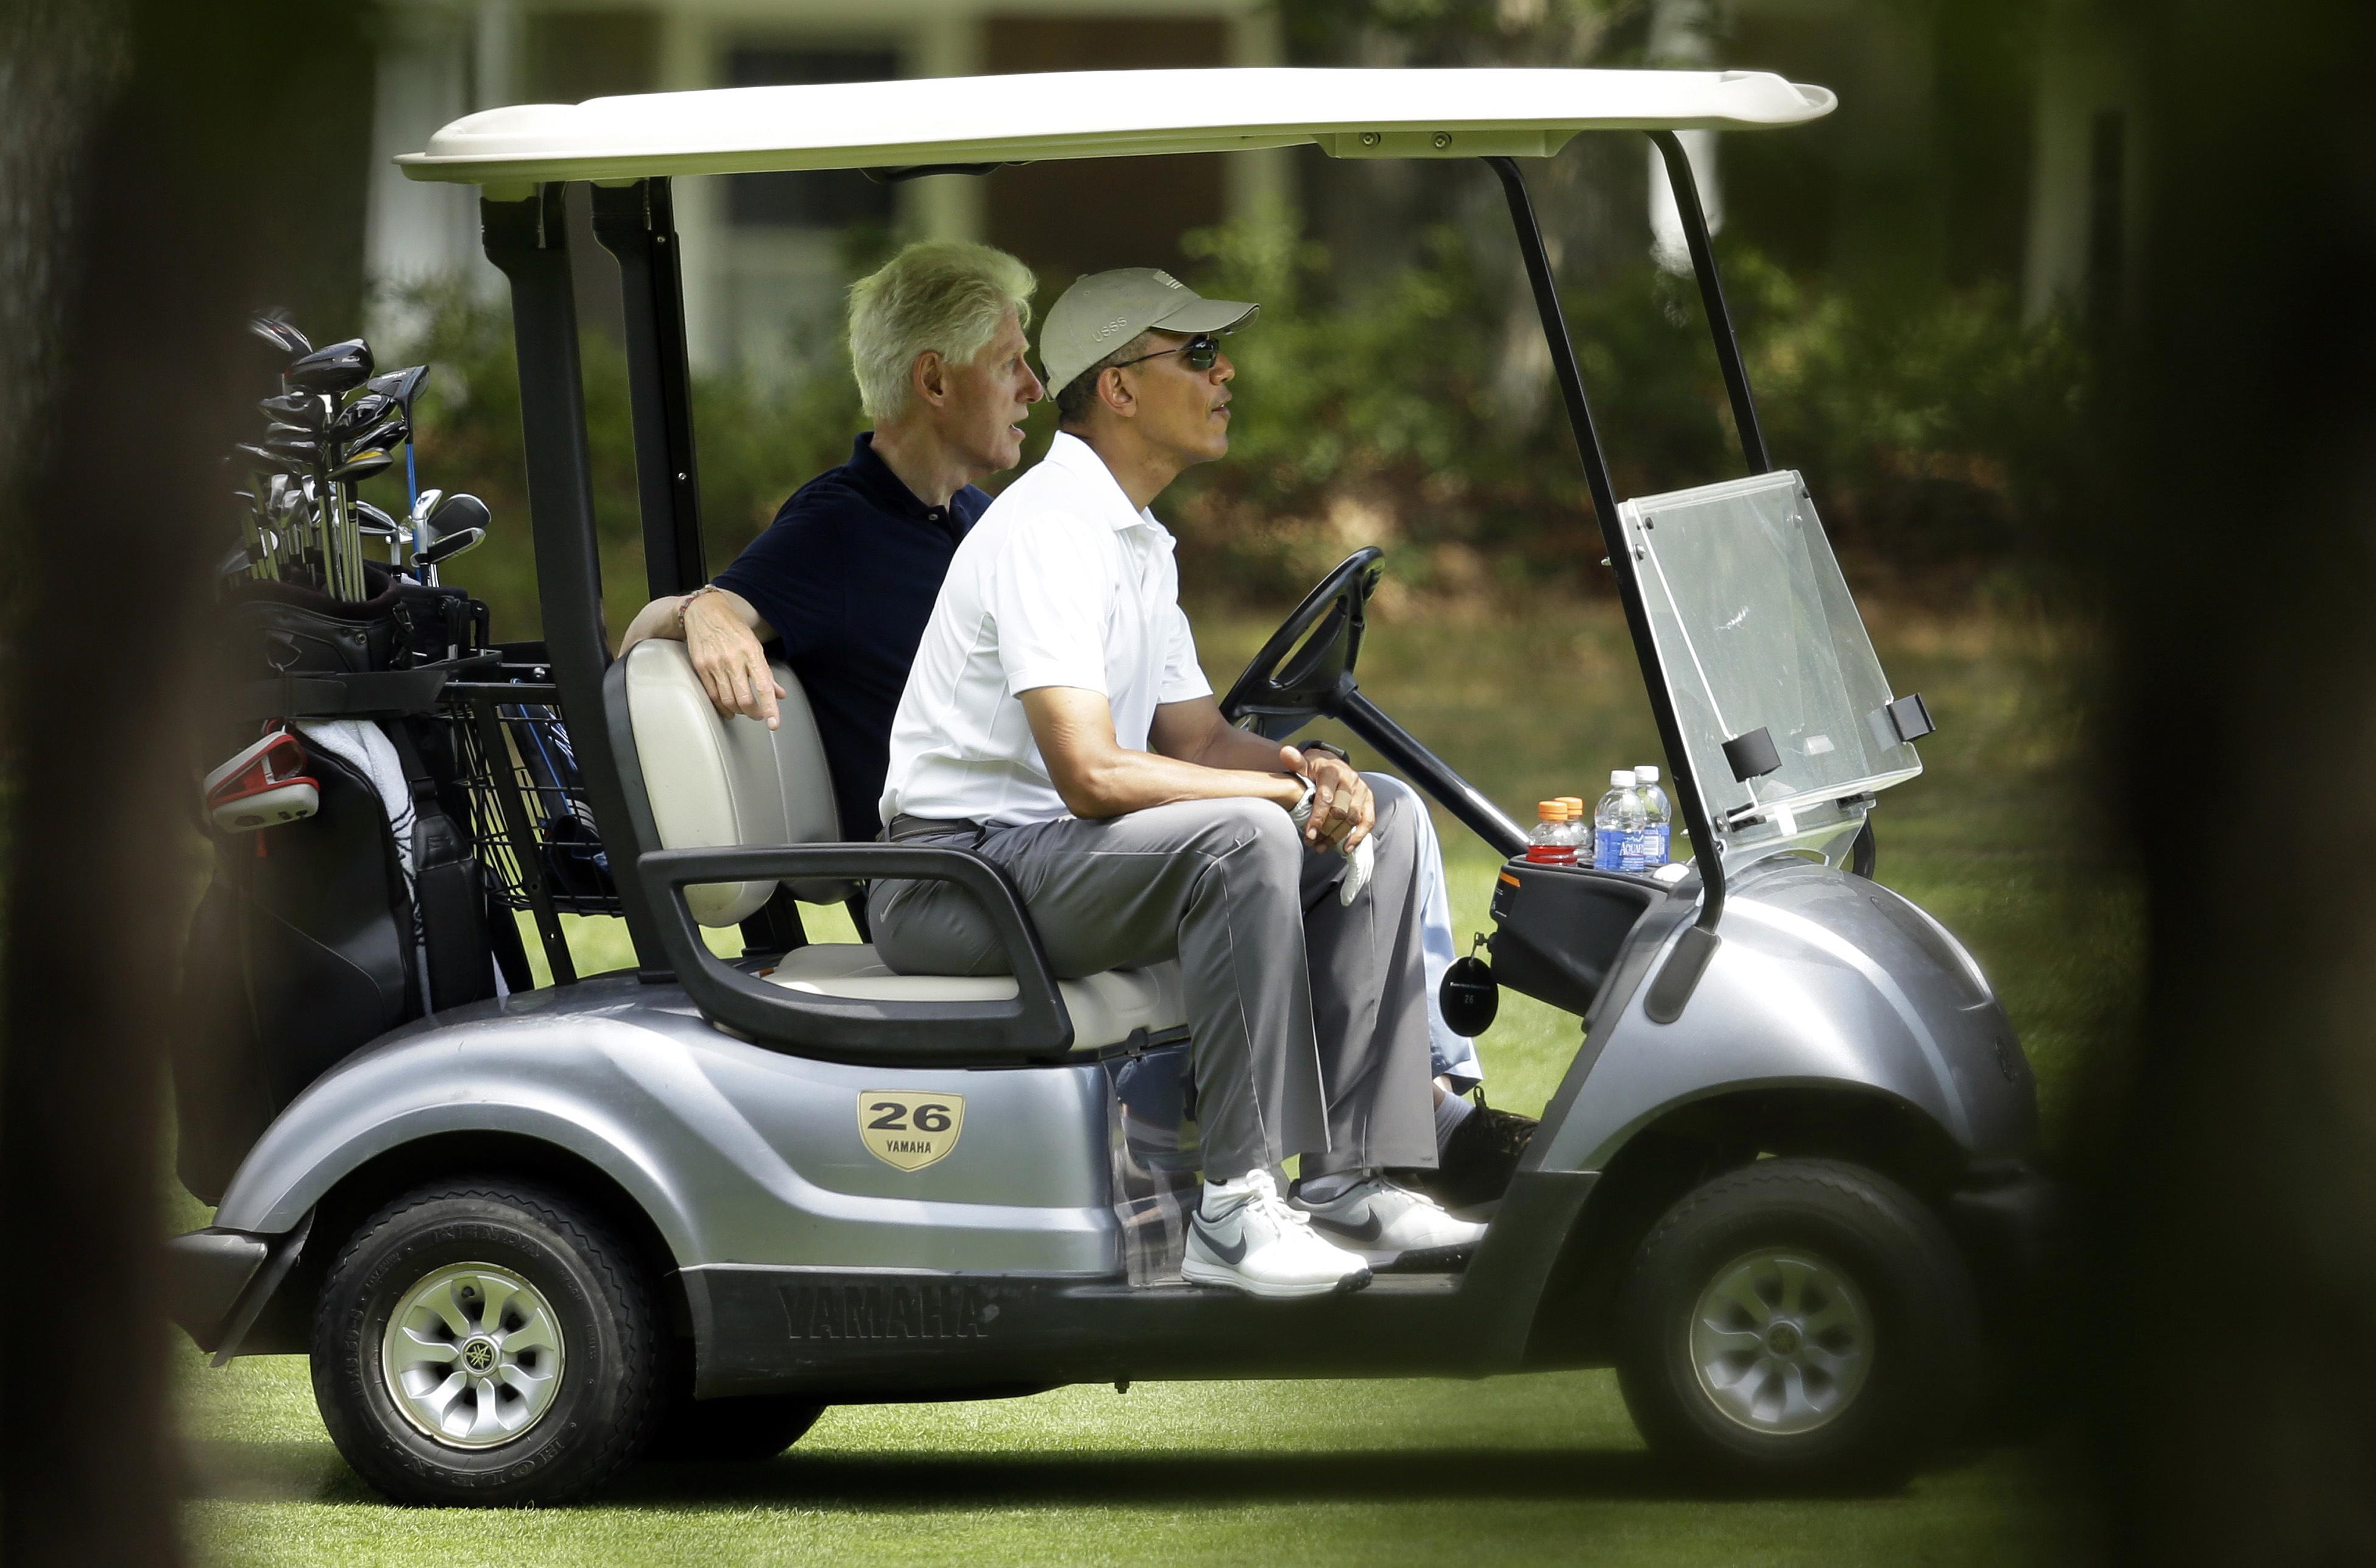 President Barack Obama and former President Bill Clinton enjoy a game of golf on Martha's Vineyard.